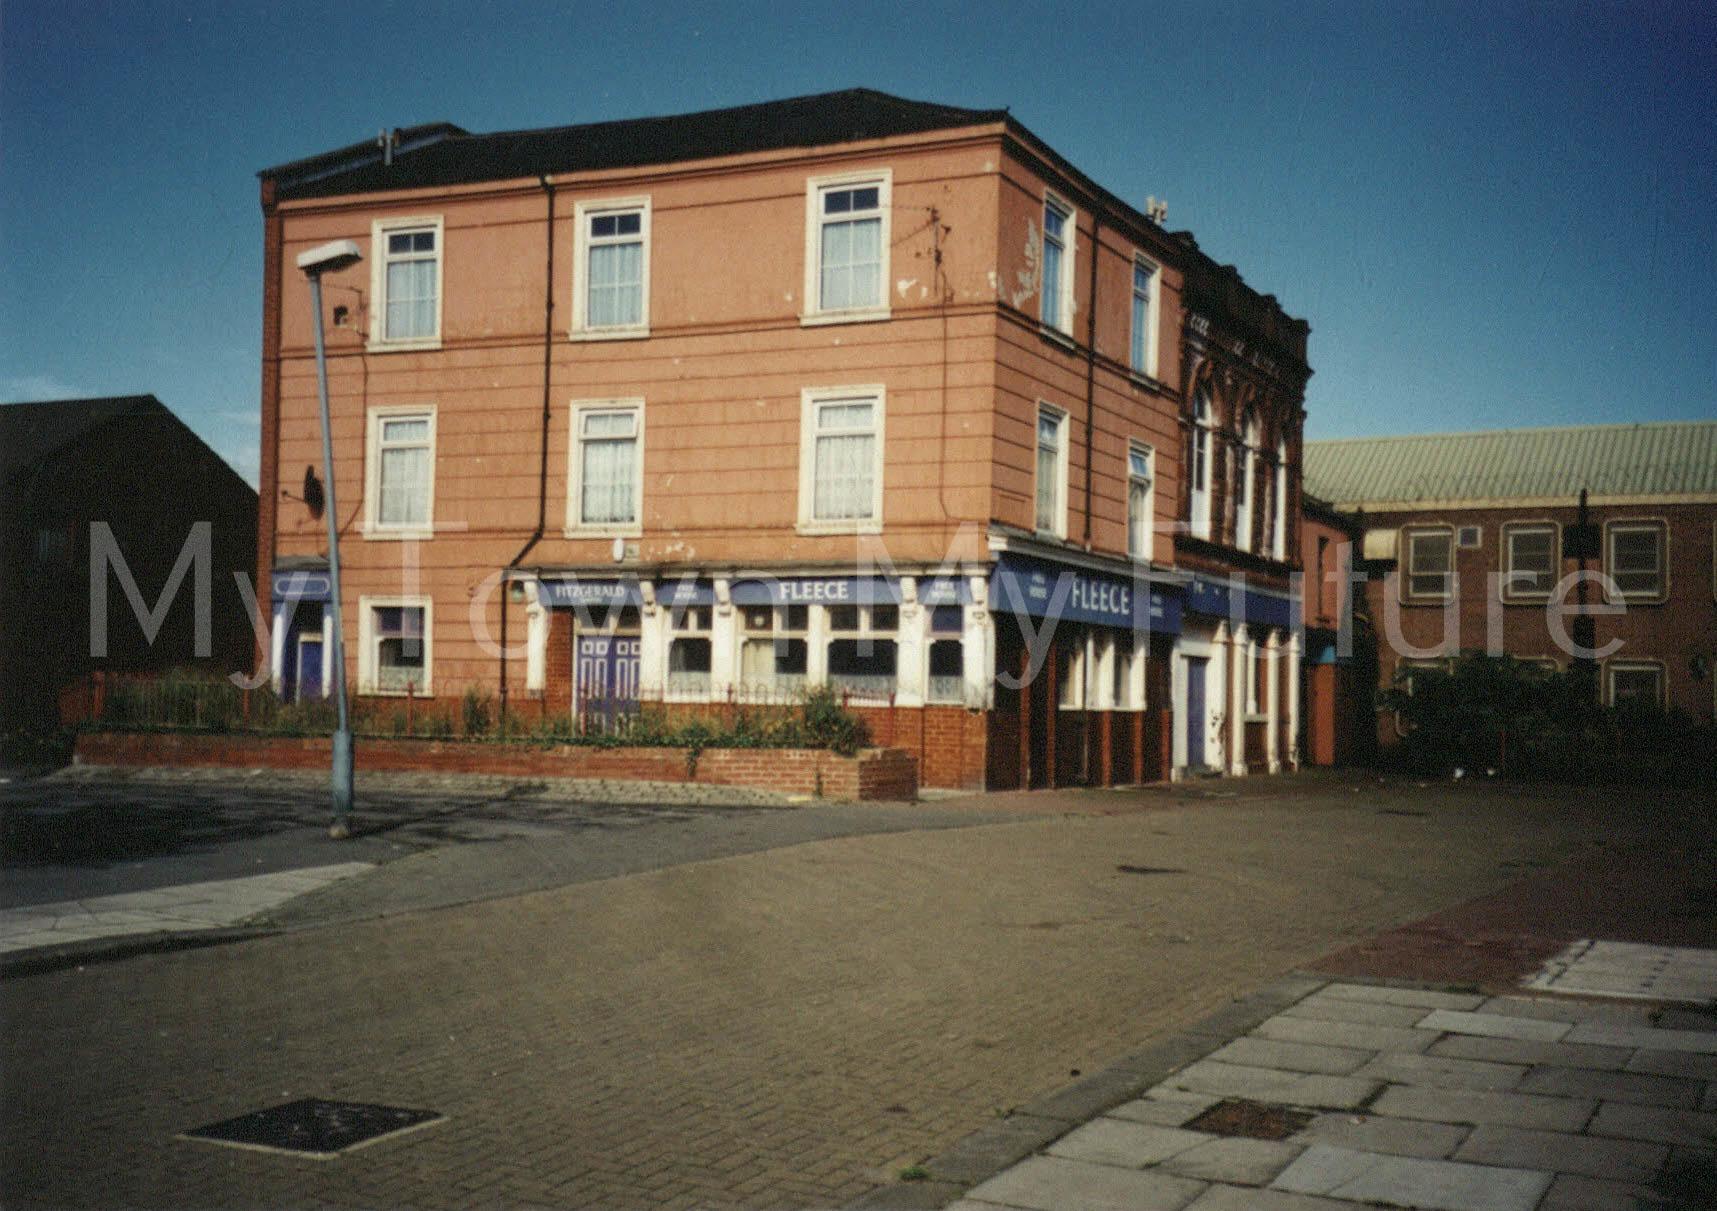 Fleece Inn - South Street - Corner of Sussex Street, 17th June 1999, Paul Stephenson